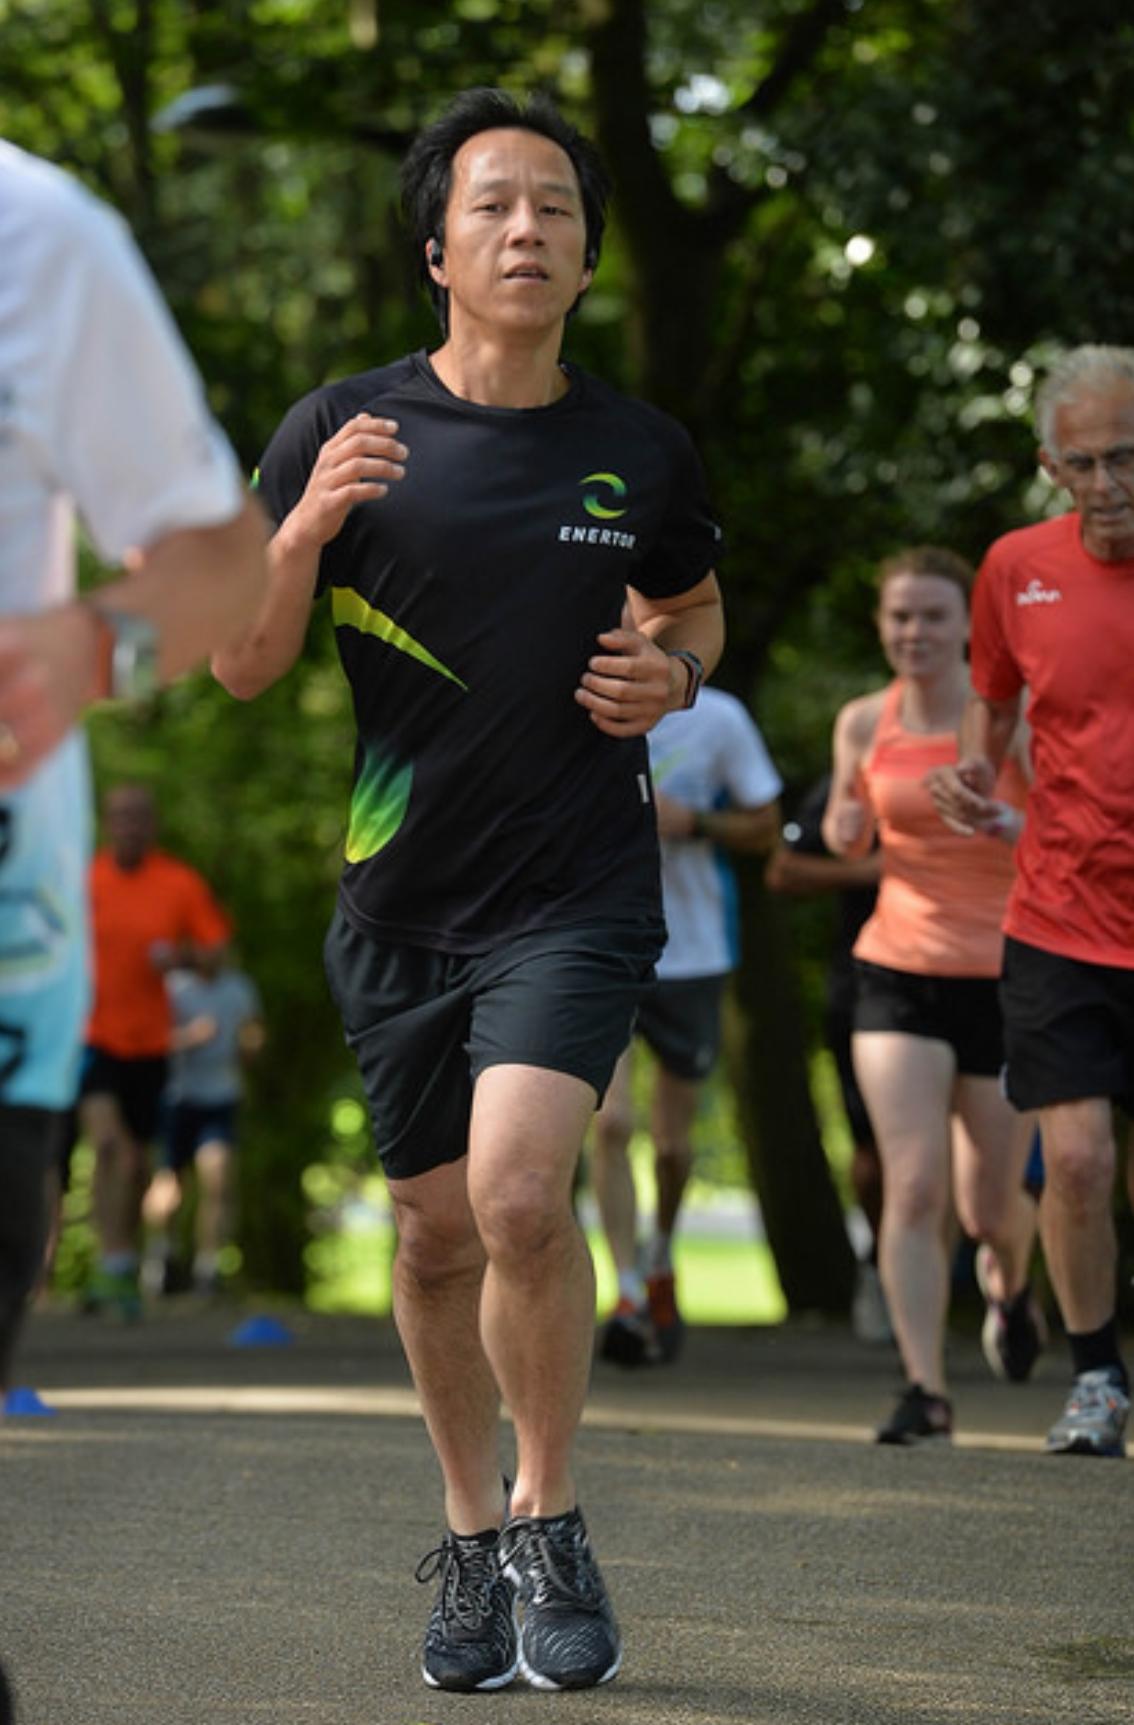 Hanley Park Run 5 August